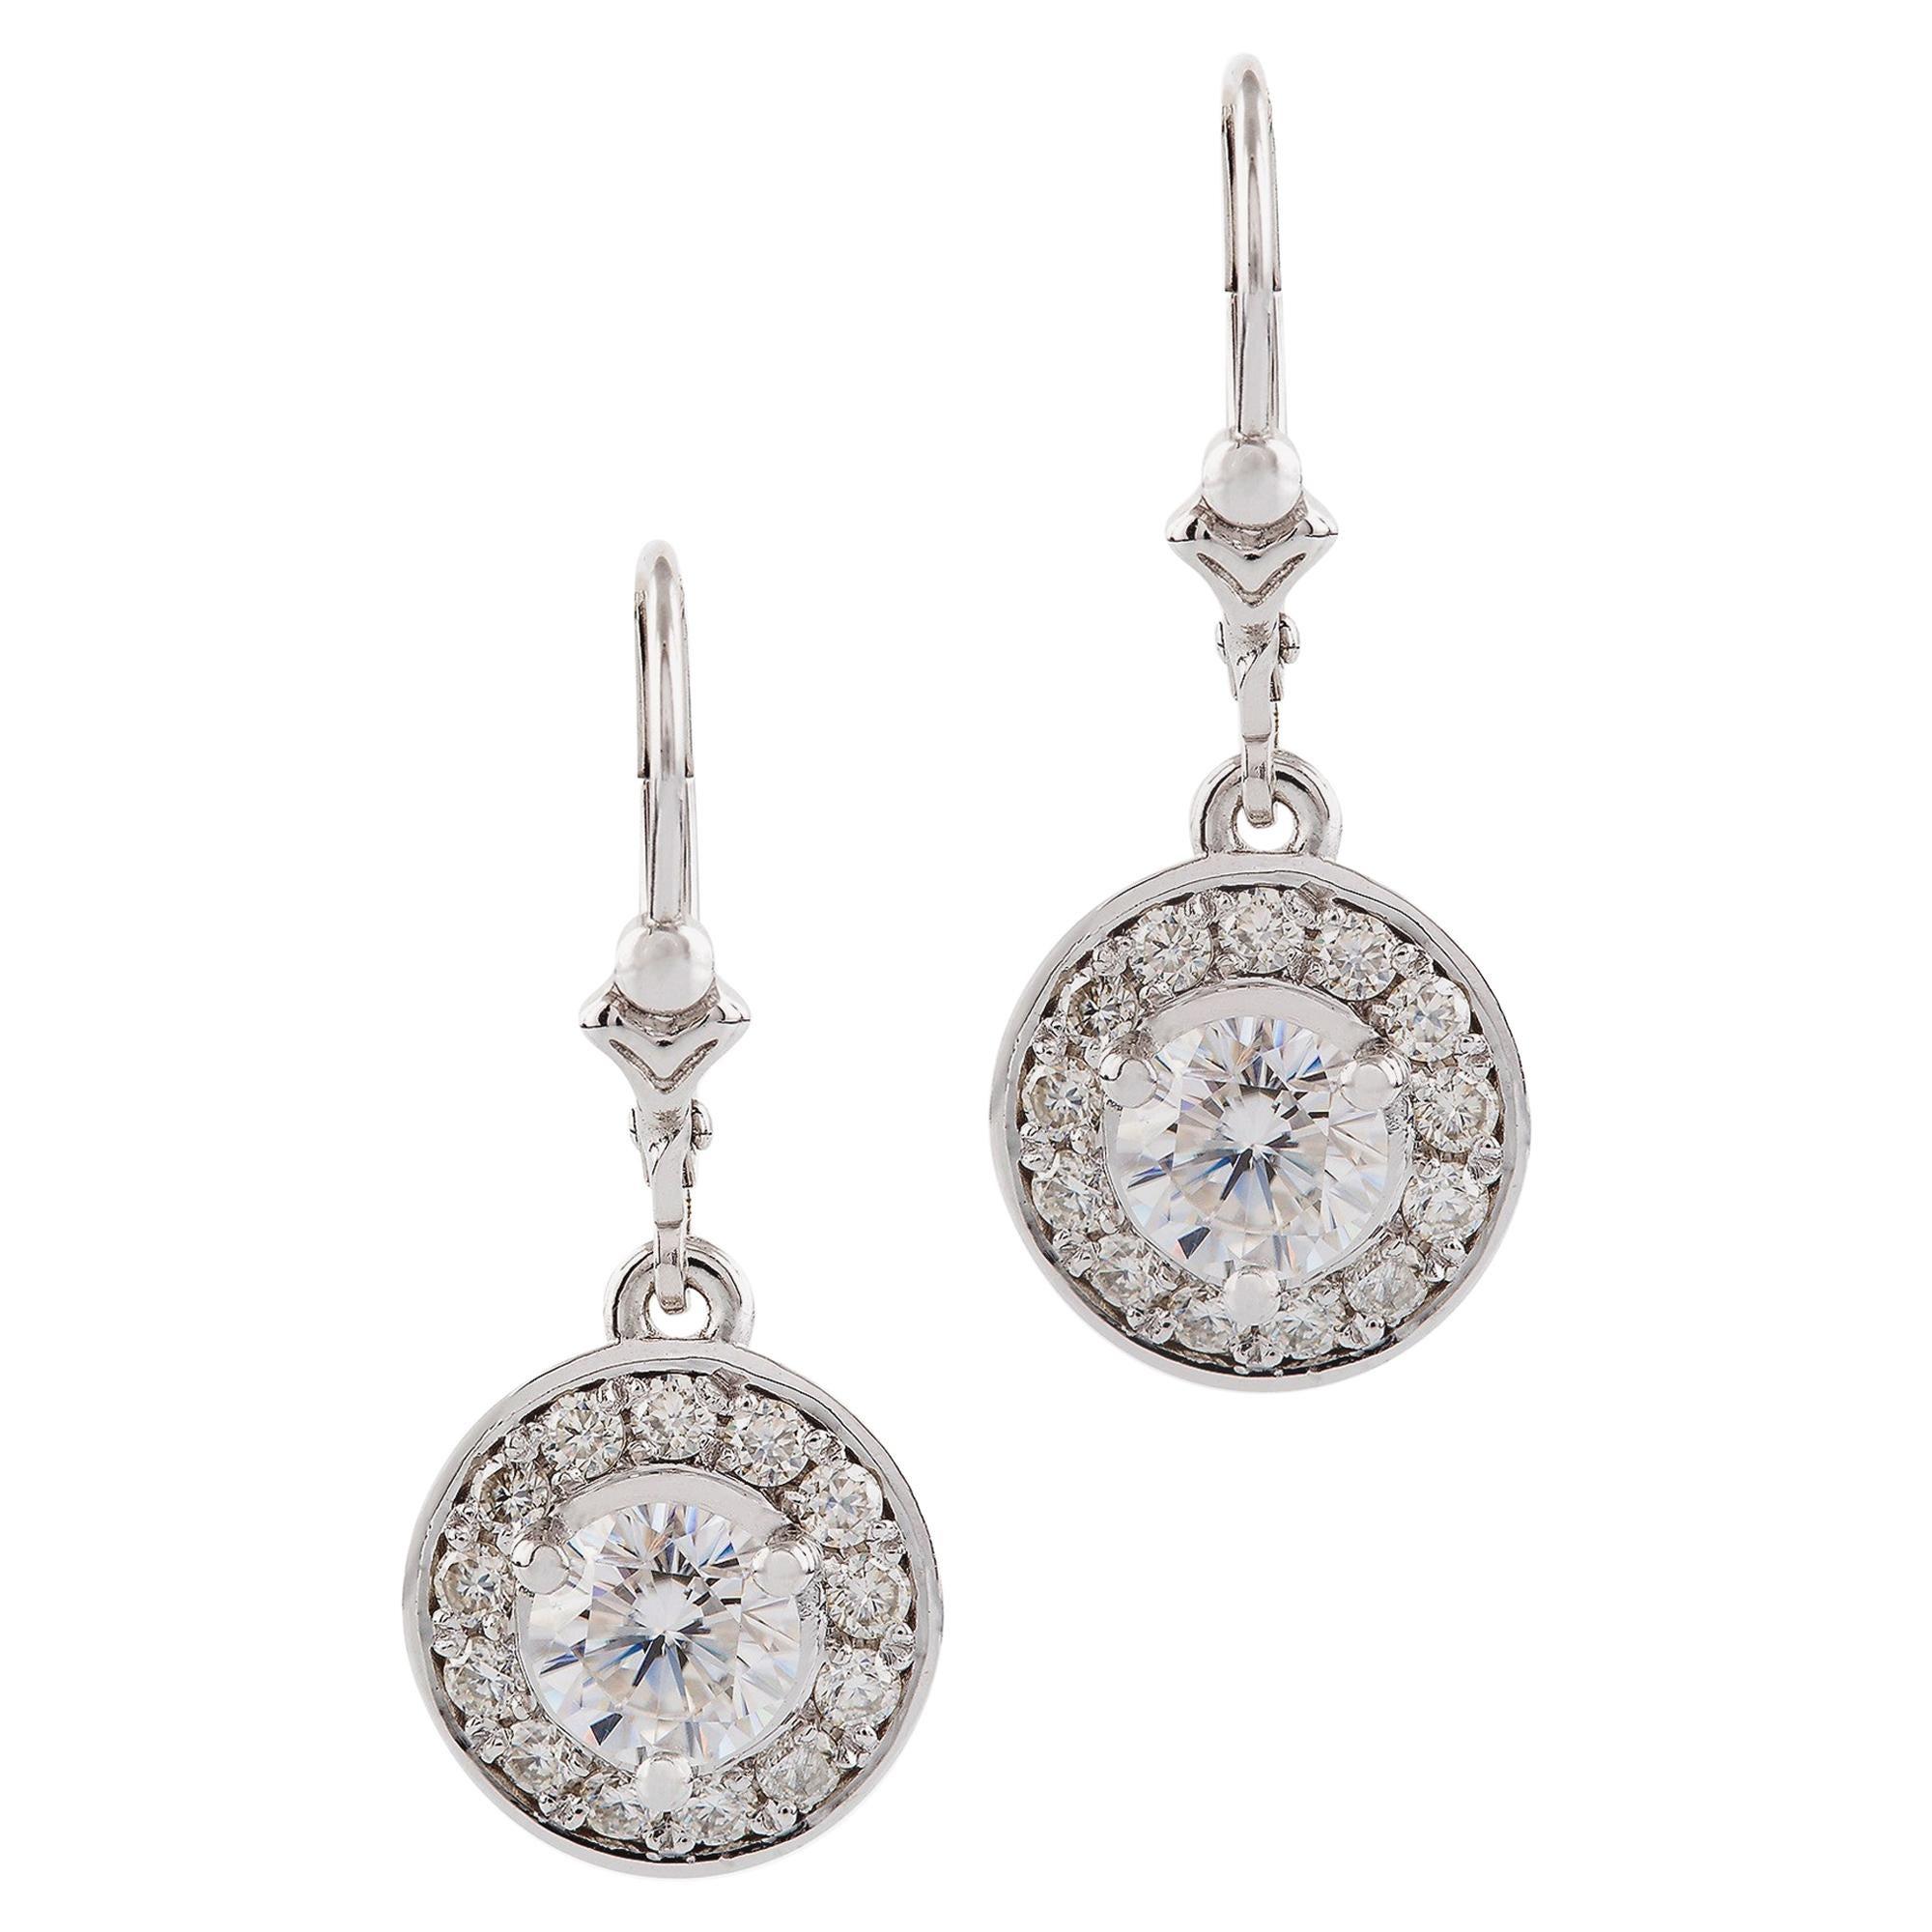 Kian Design White Gold 1.6 Carat Round Brilliant Cut Diamond Halo Drop Earrings